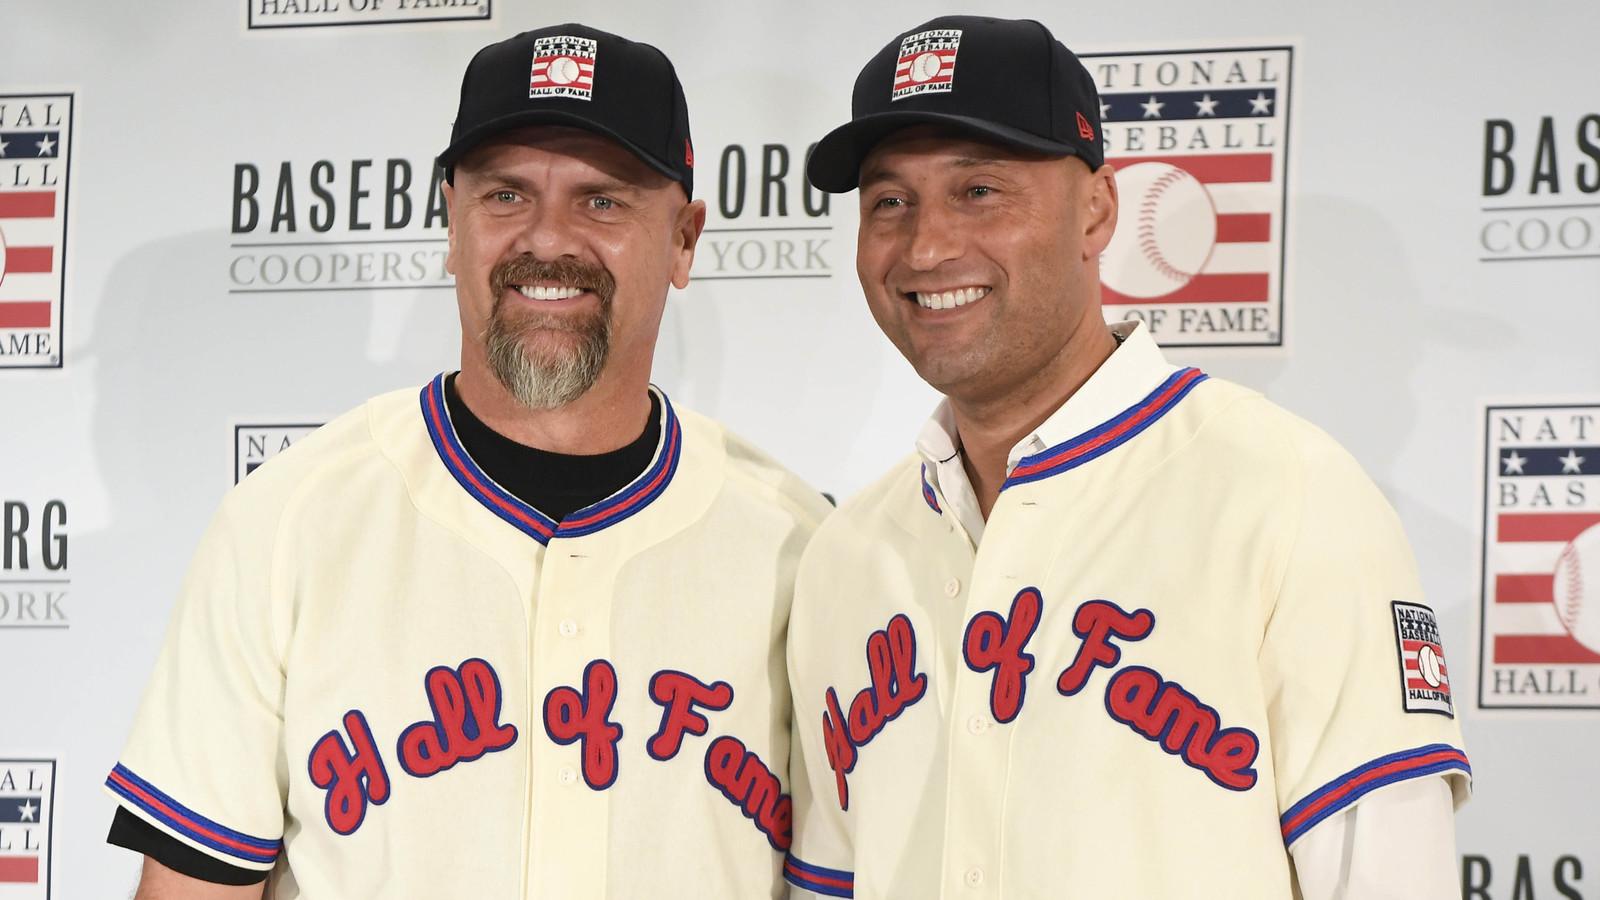 2020 Baseball Hall of Fame induction postponed to September 8